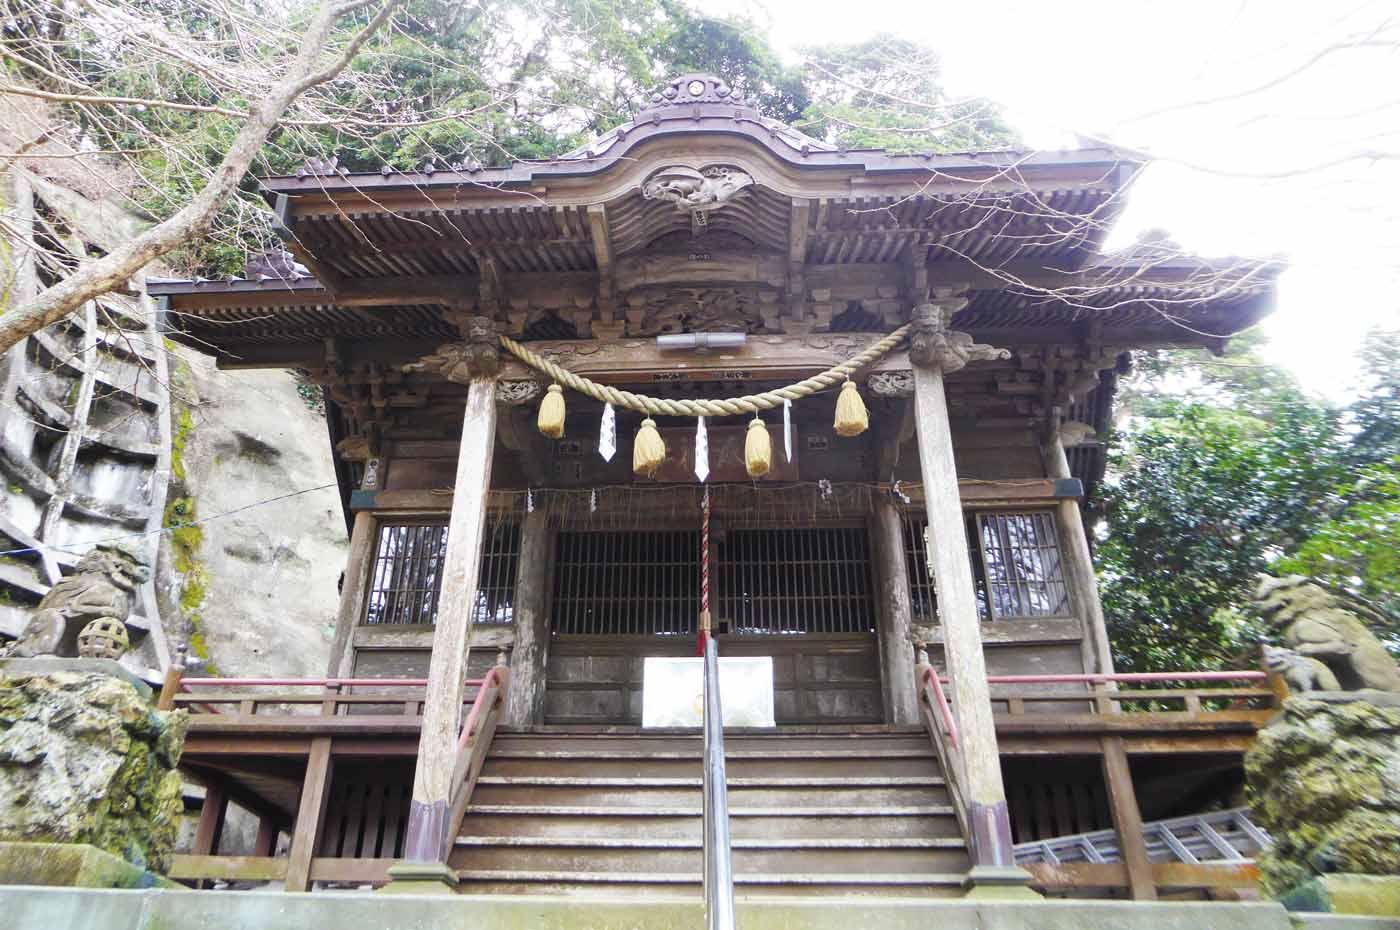 小湊神社拝殿アップ